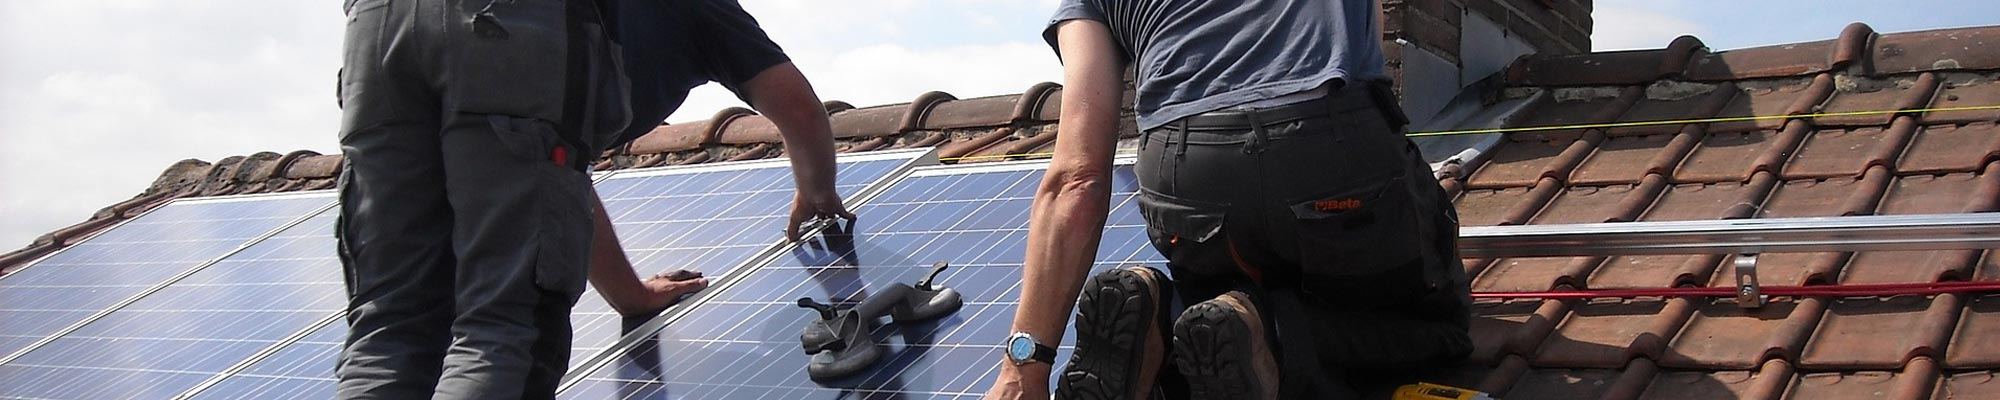 Solar Photo Voltaic Panels (PV)